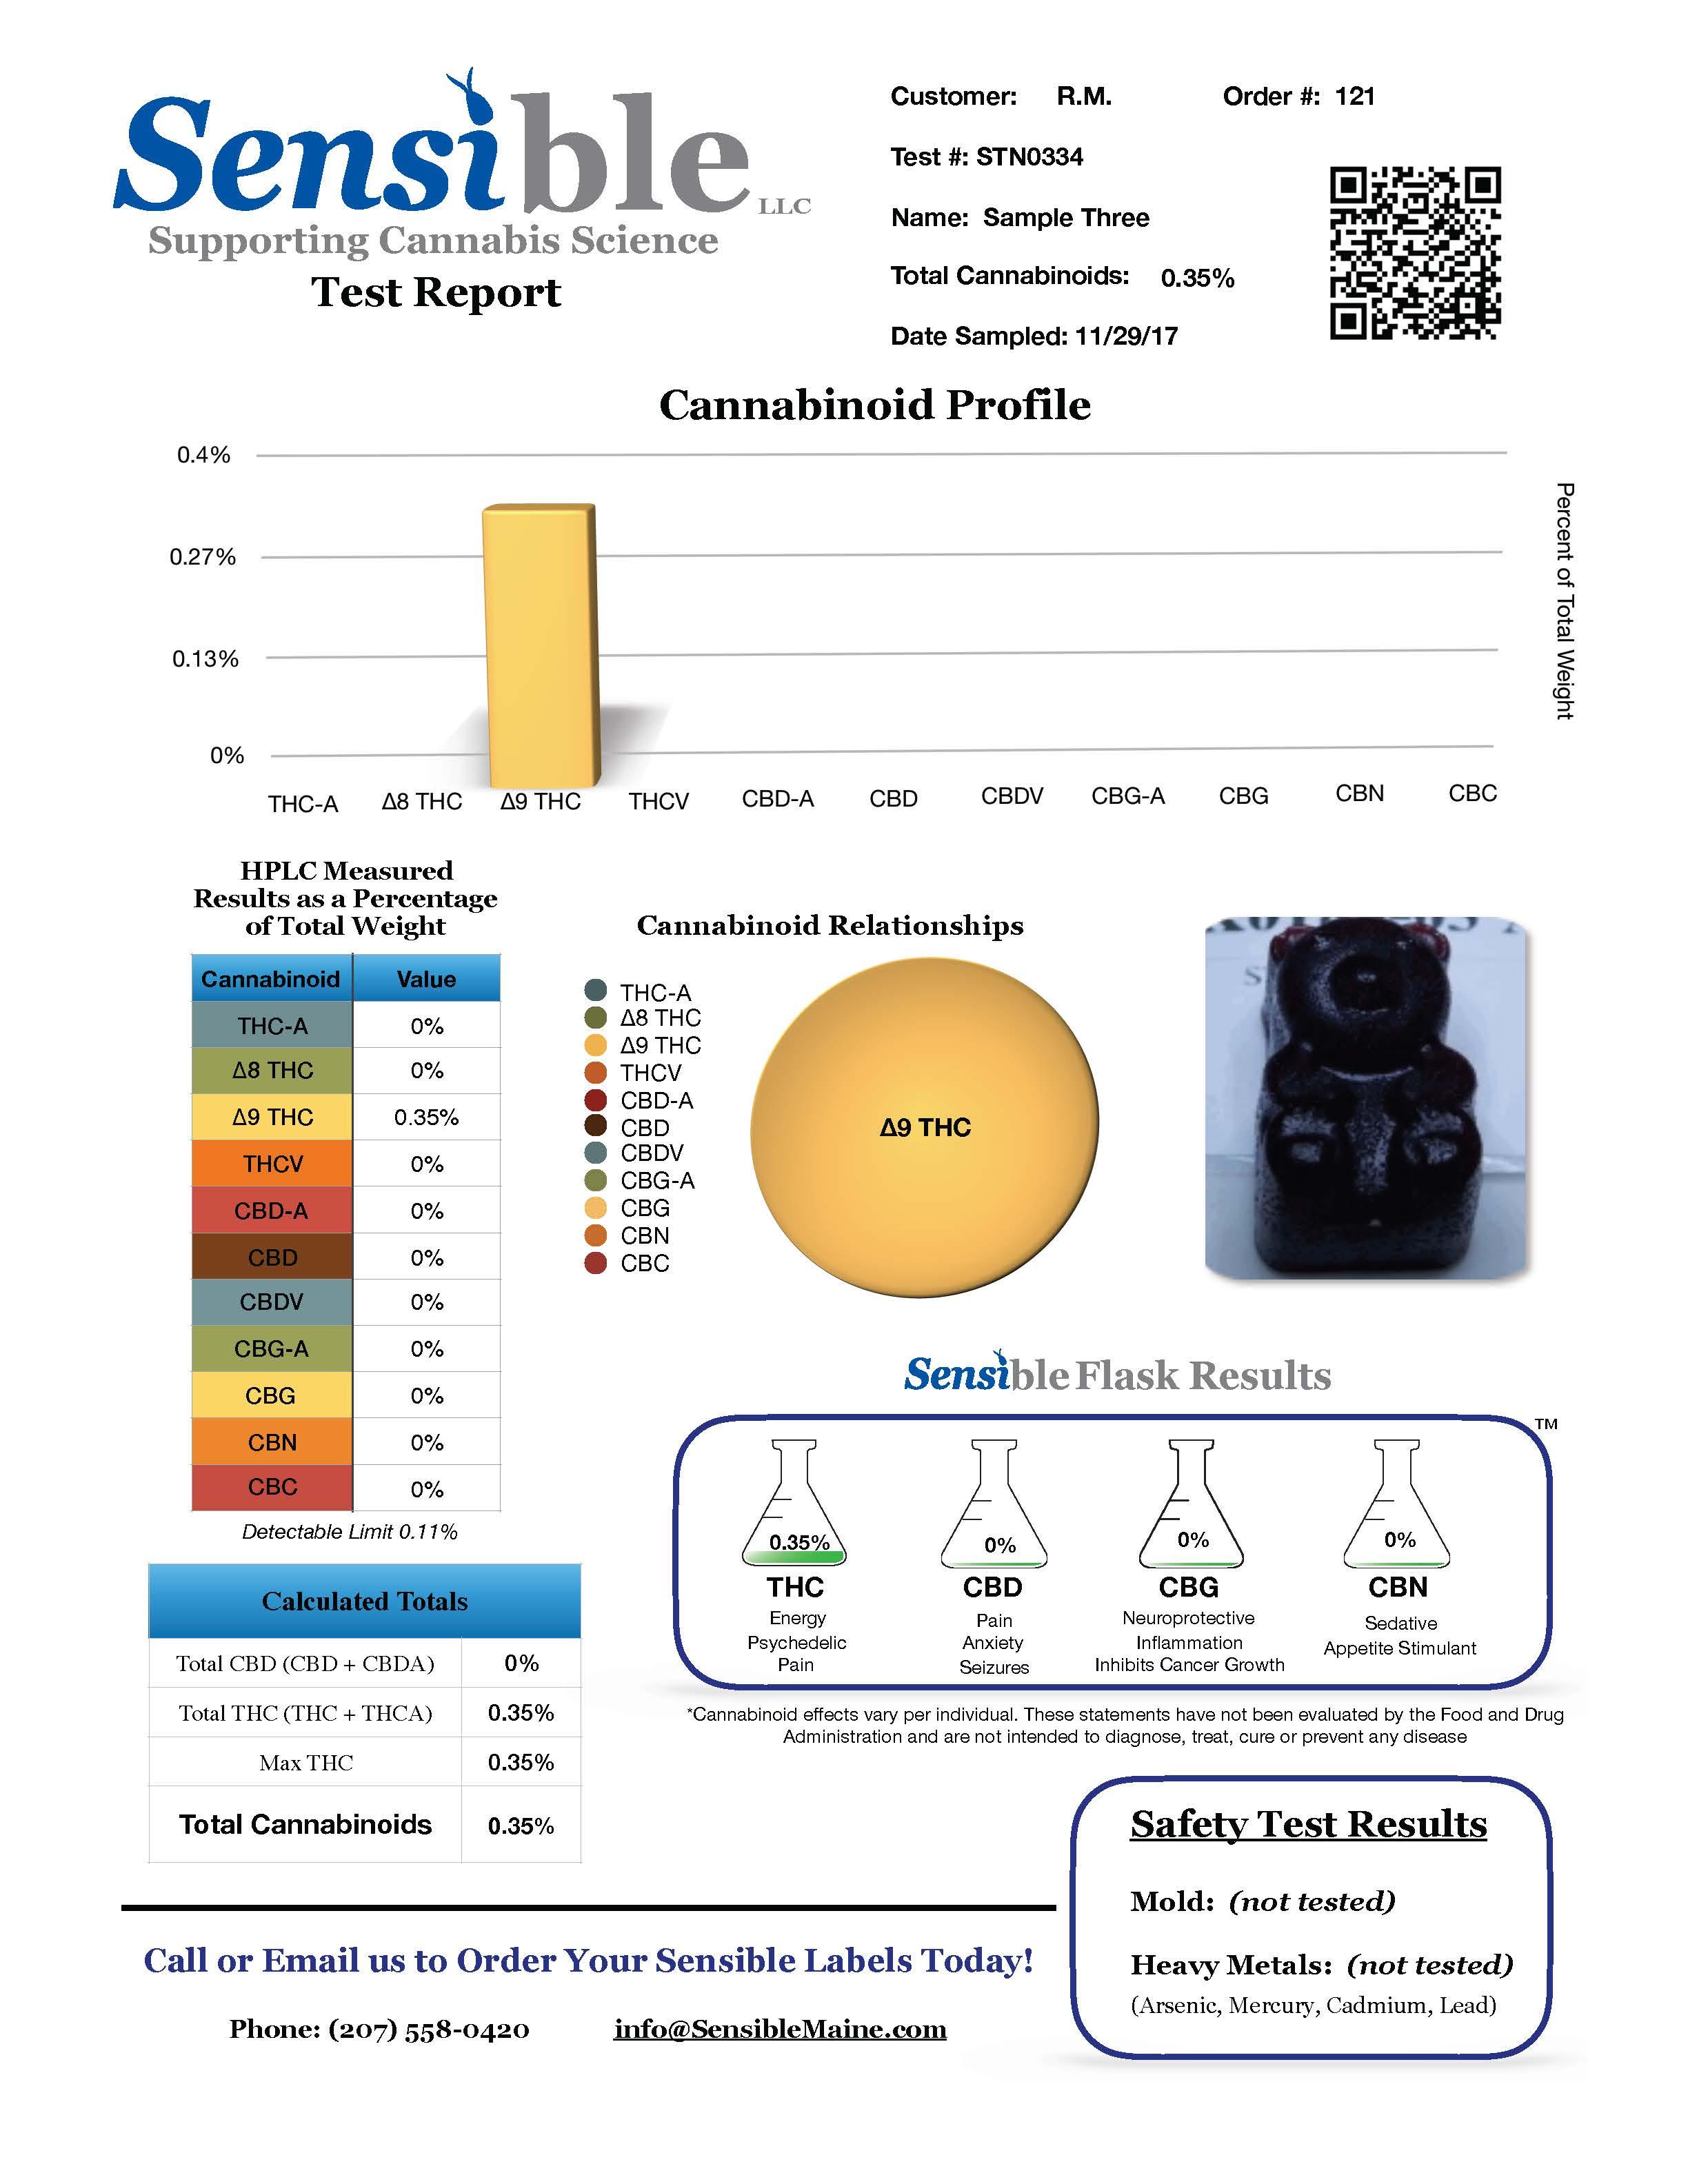 Test Report stn0334.jpg